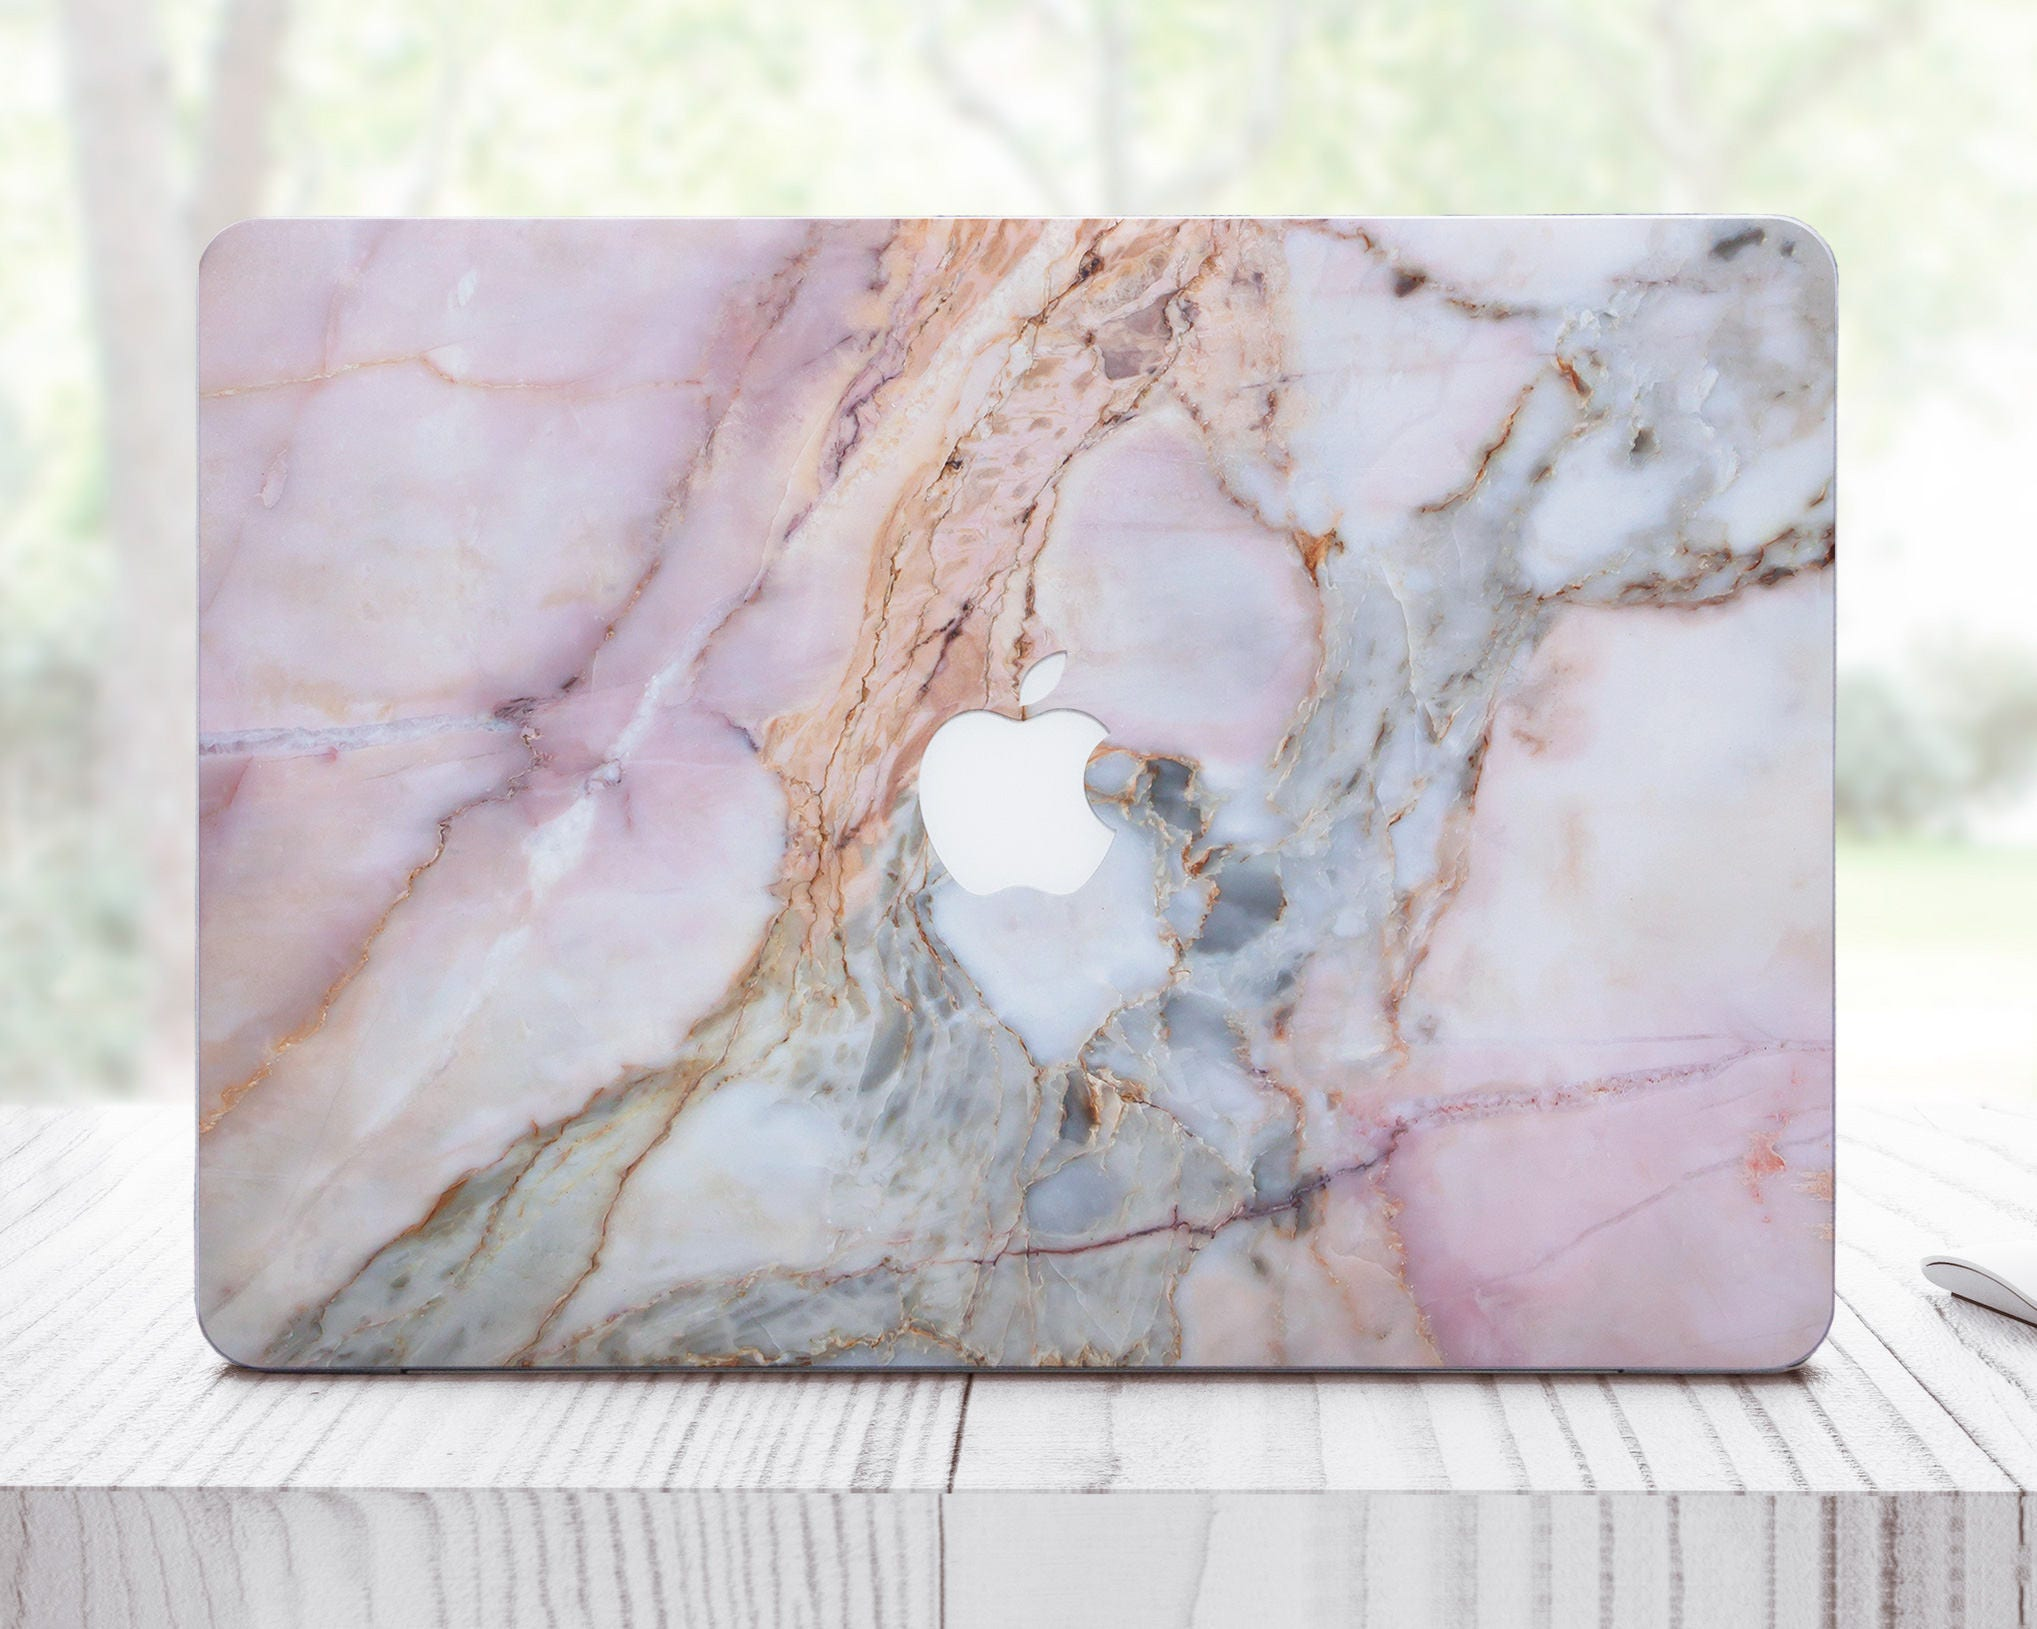 Pink Marble Laptop Decal MacBook Pro Skin Laptop Skin MacBook Cover MacBook Decal Stickers MacBook Pro MacBook Sticker Asus  ES0026